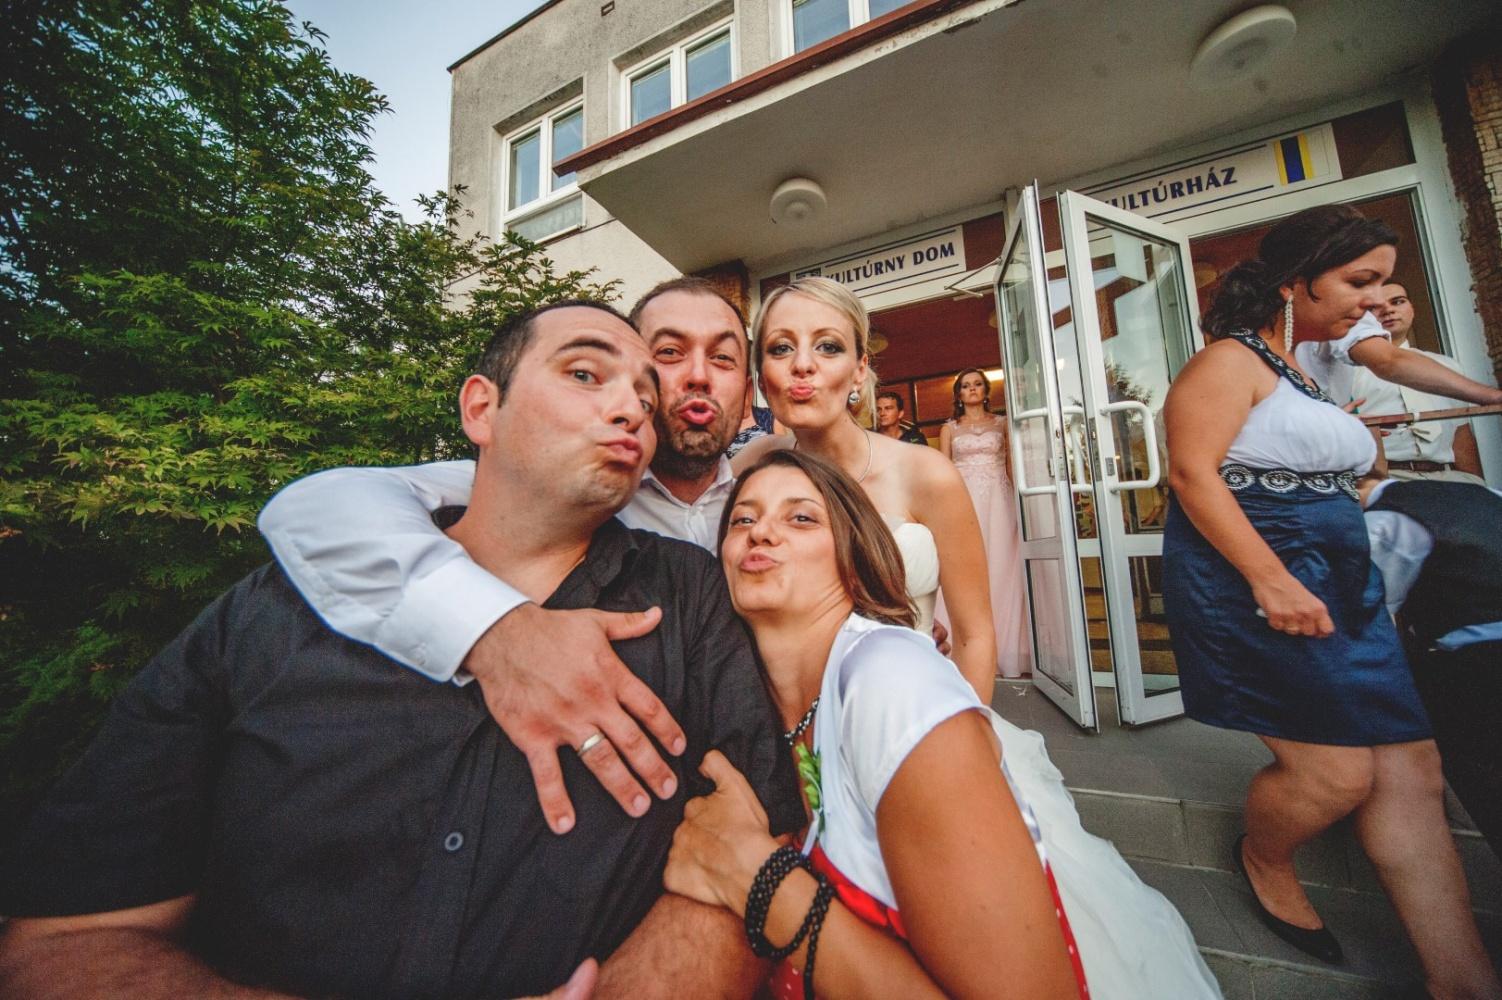 http://www.fotoz.sk/images/gallery-21/normal/svadobne-fotenie_eskuvoi-fotos_259.jpg